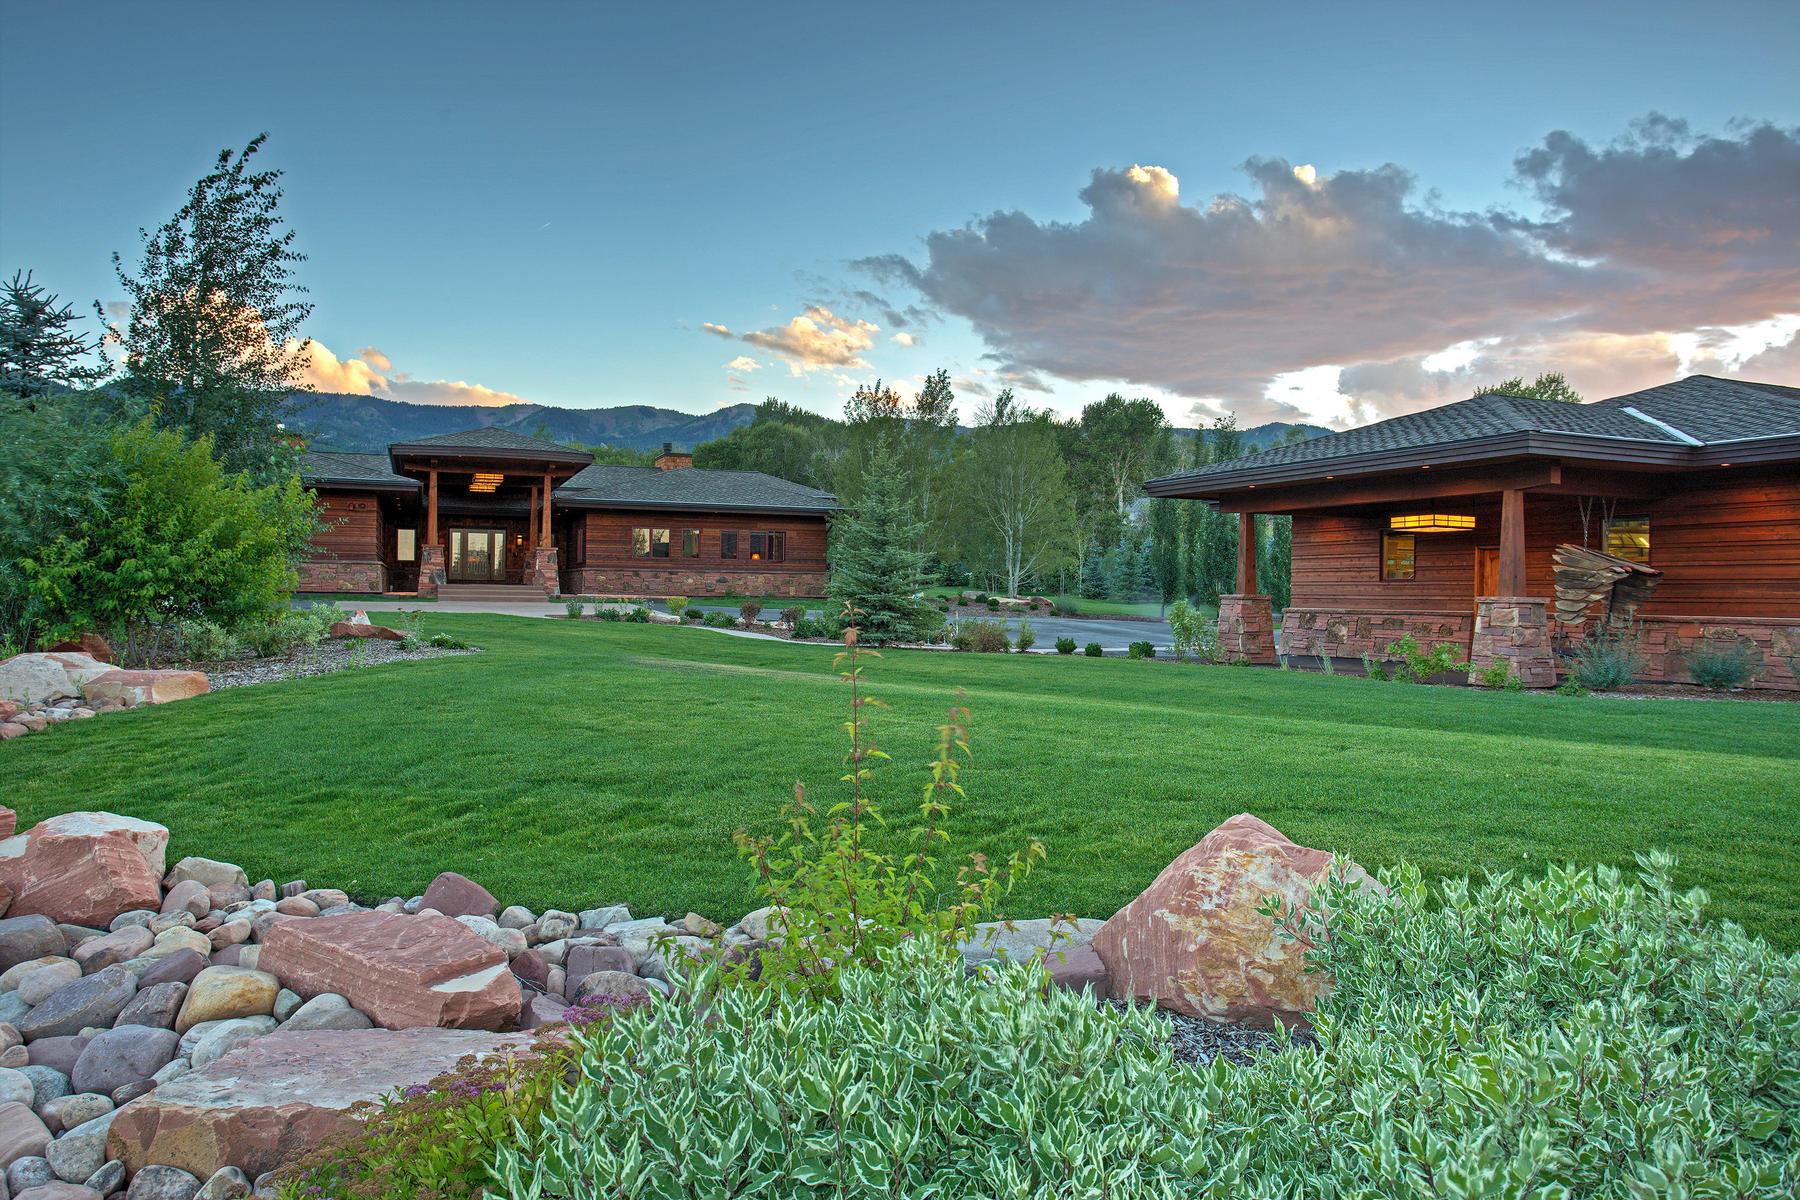 独户住宅 为 销售 在 Old Ranch Road Sanctuary with Guest Home 4275 Quarry Mountain Rd 帕克城, 犹他州, 84098 美国